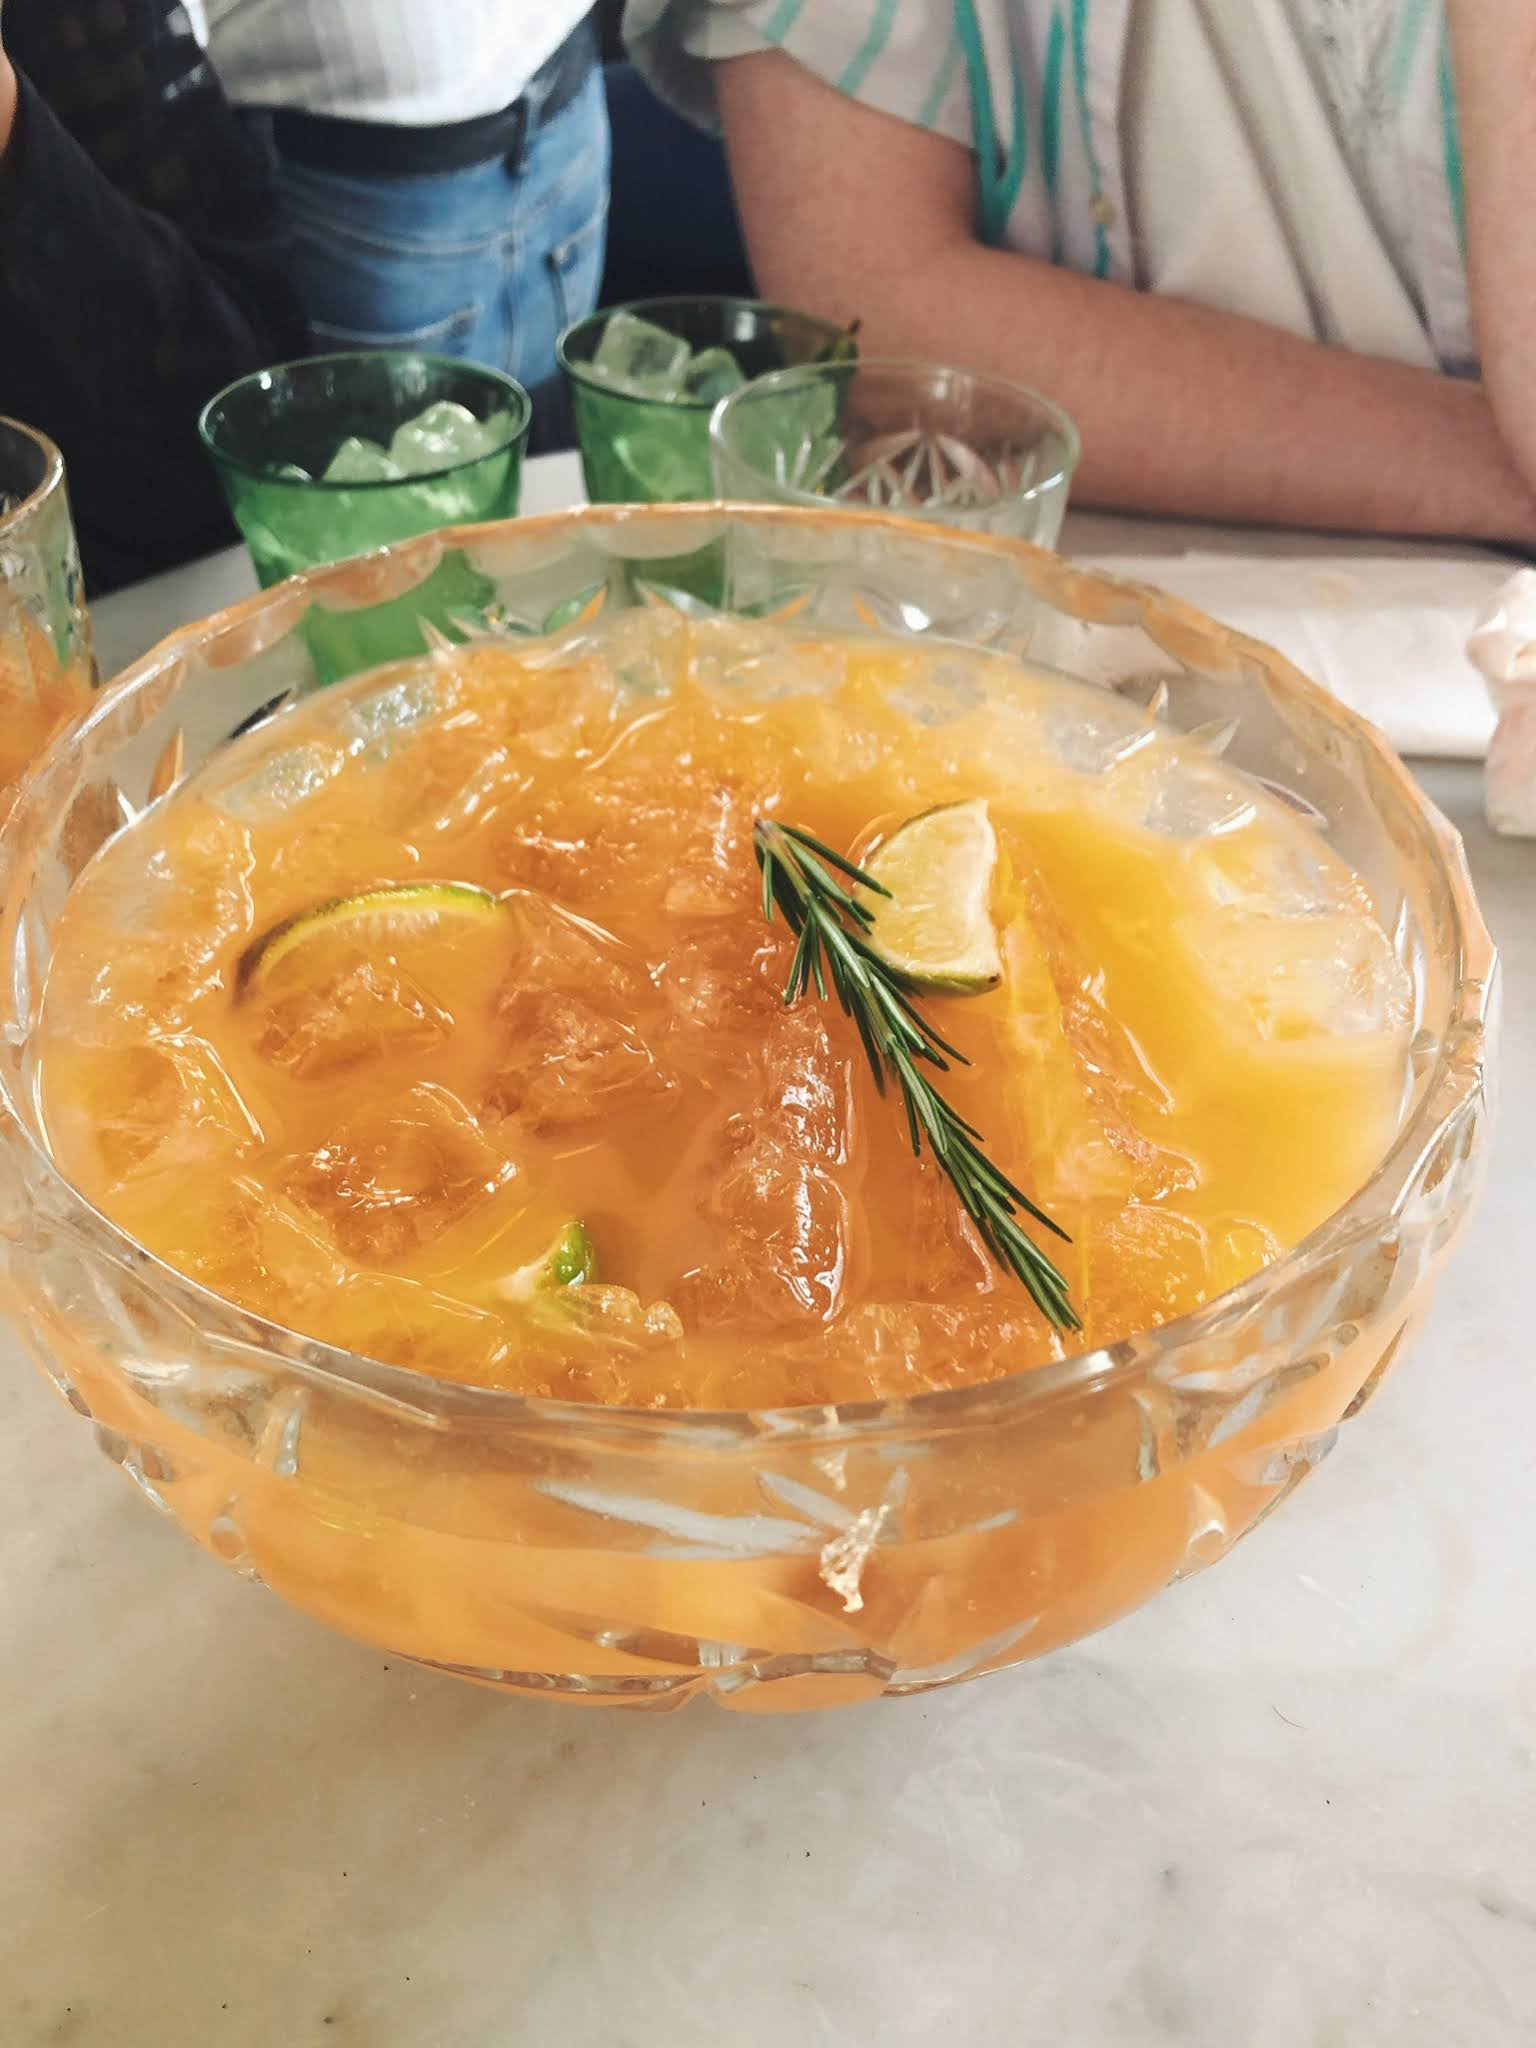 serata hall london bottomless brunch old street rum punch bowl